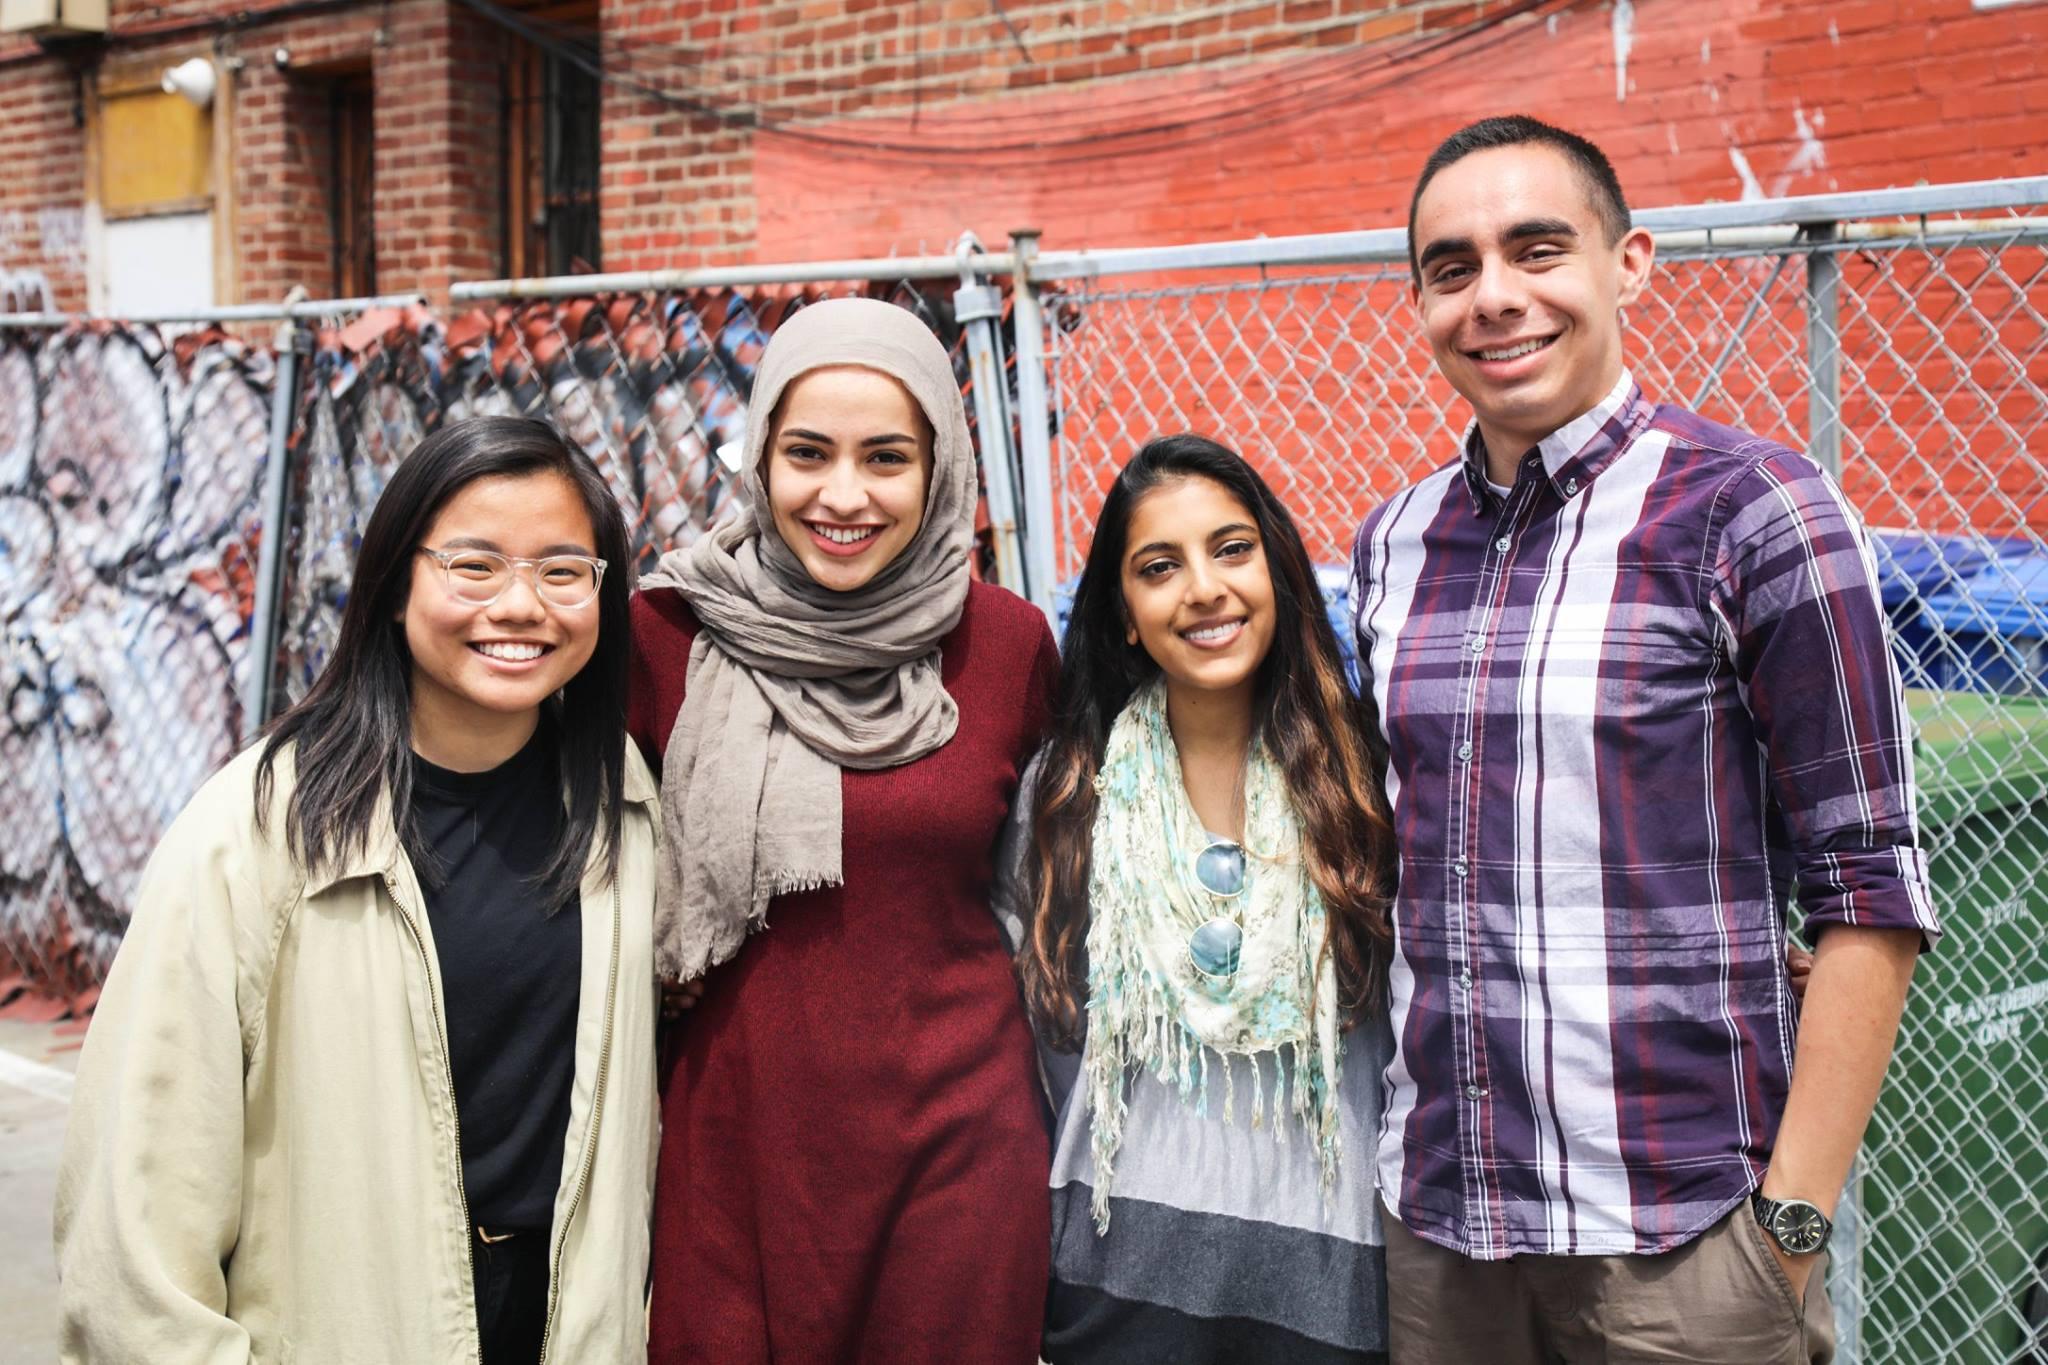 Left to Right: Carolyn Hsieh, Hajar Larbah, Hafsa Khalid, Esteban Velasquez